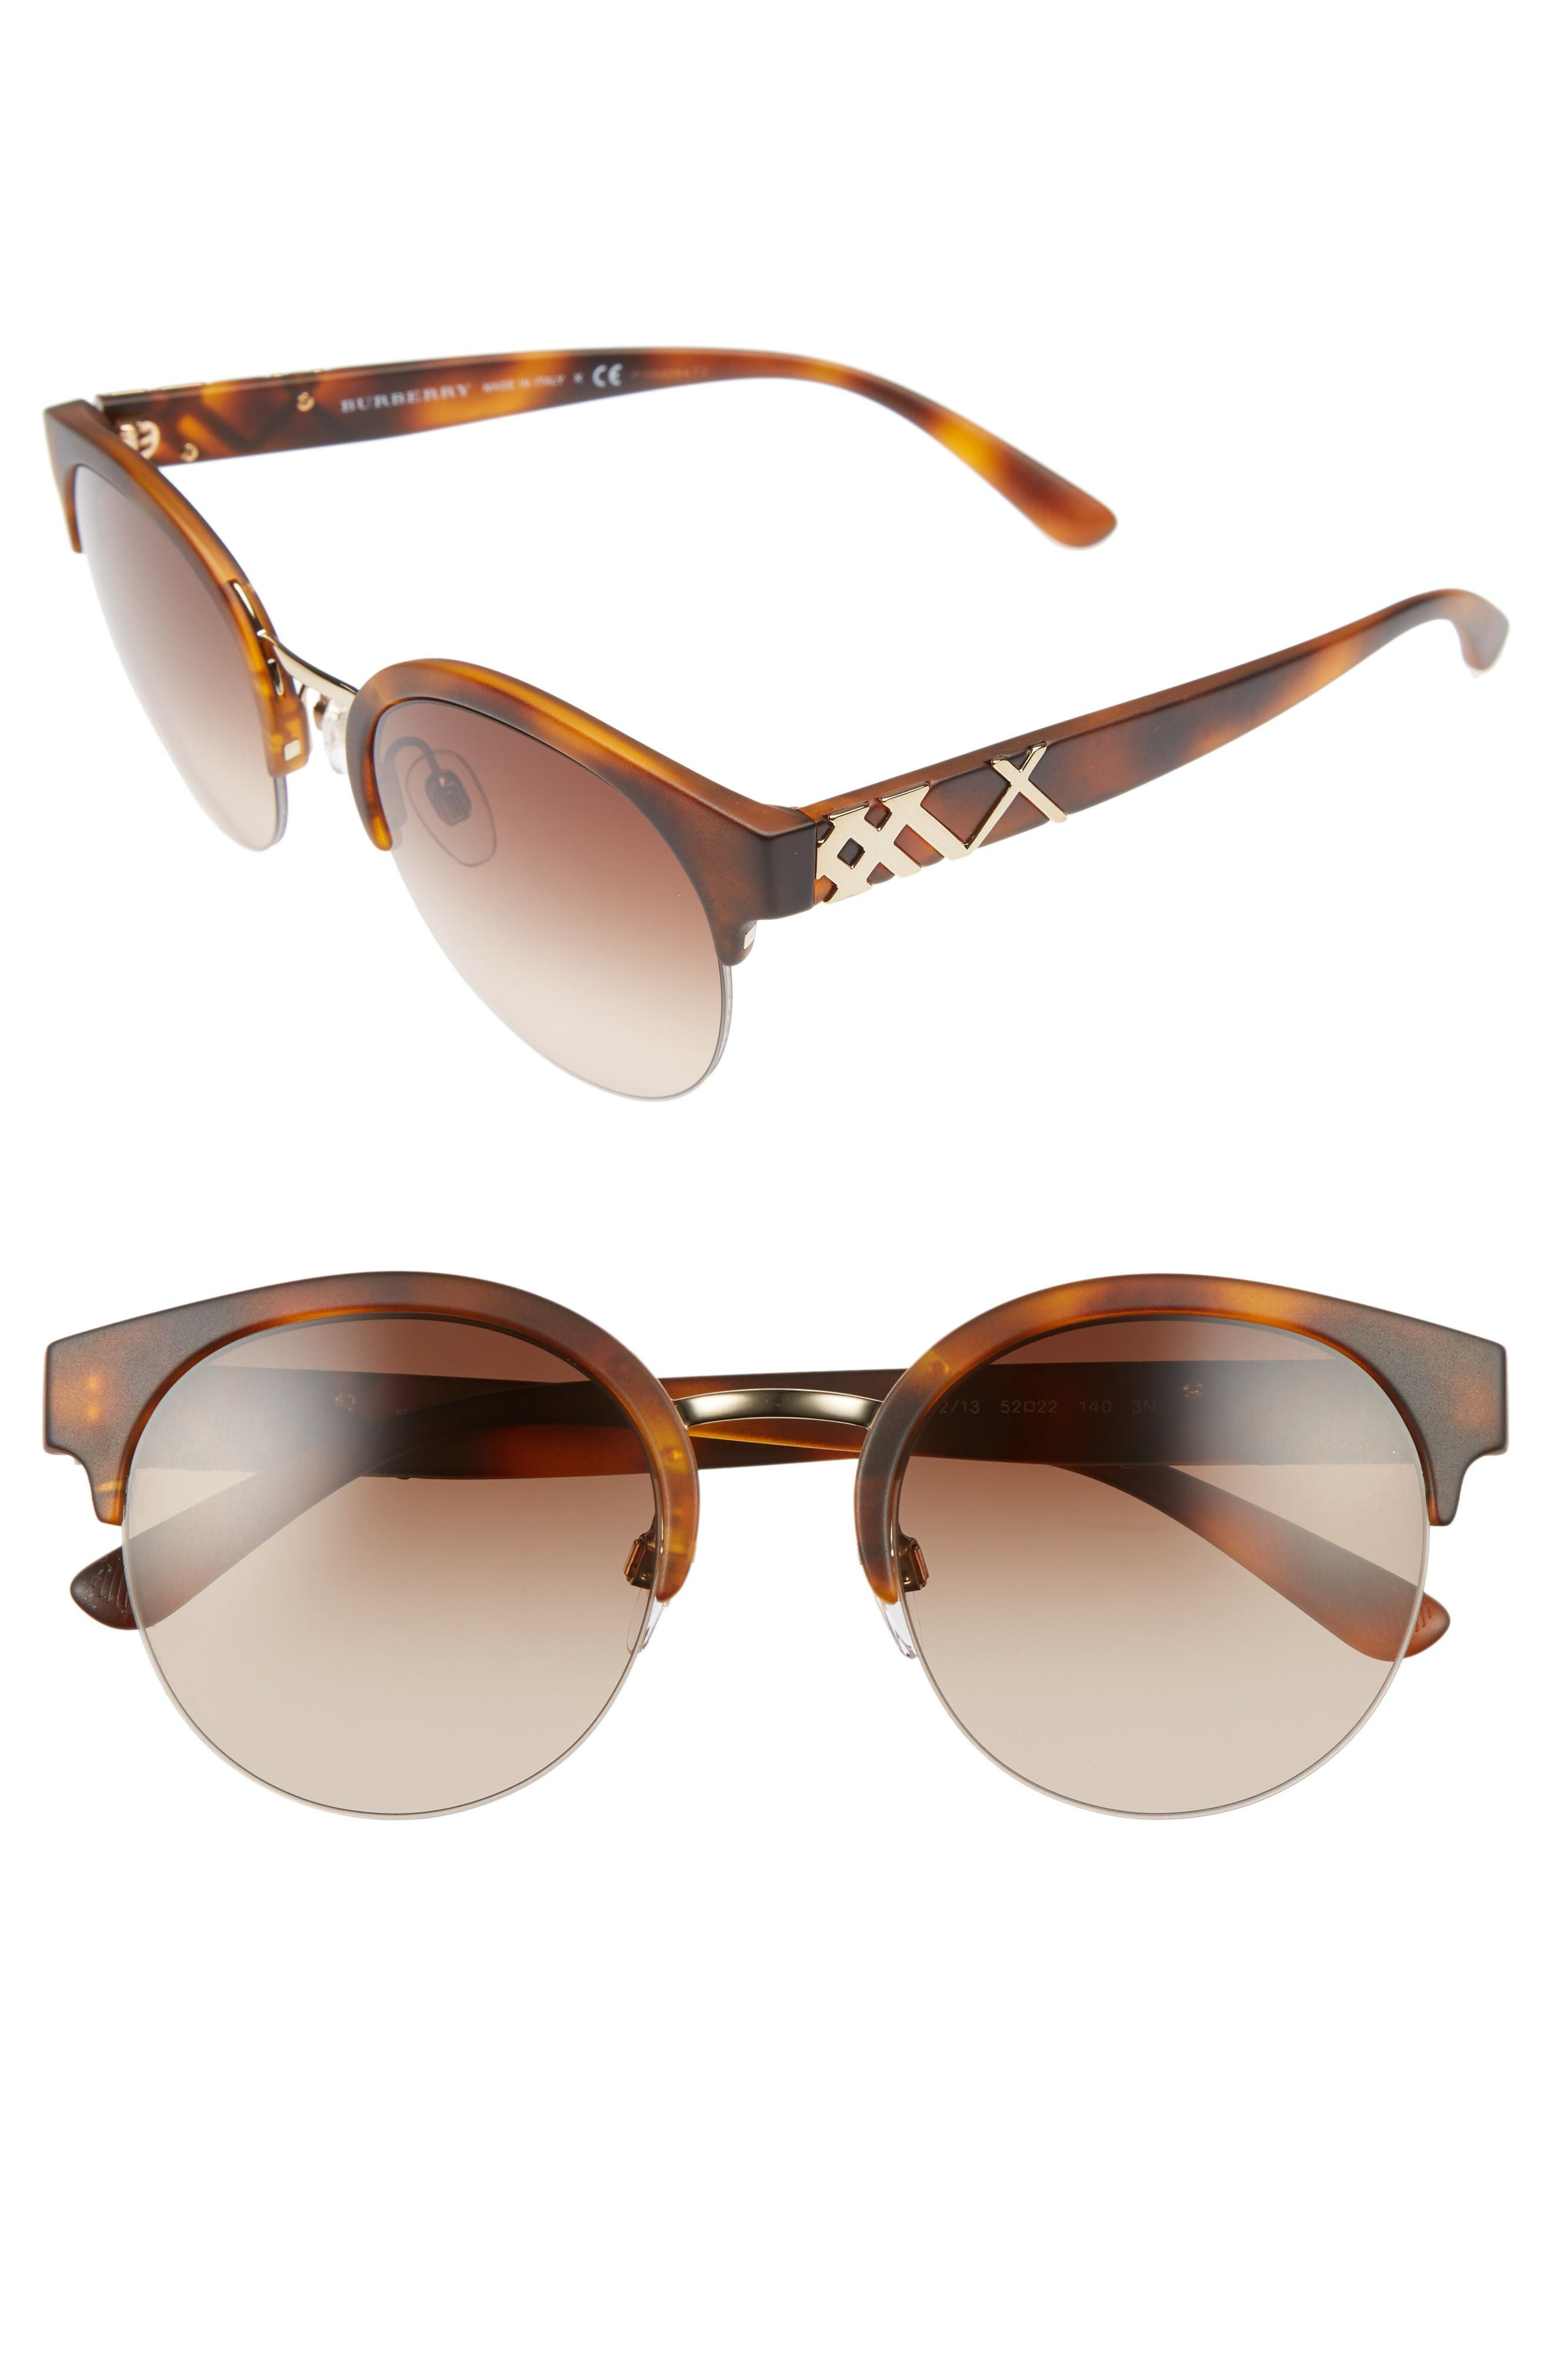 Main Image - Burberry 52mm Gradient Semi Rimless Sunglasses